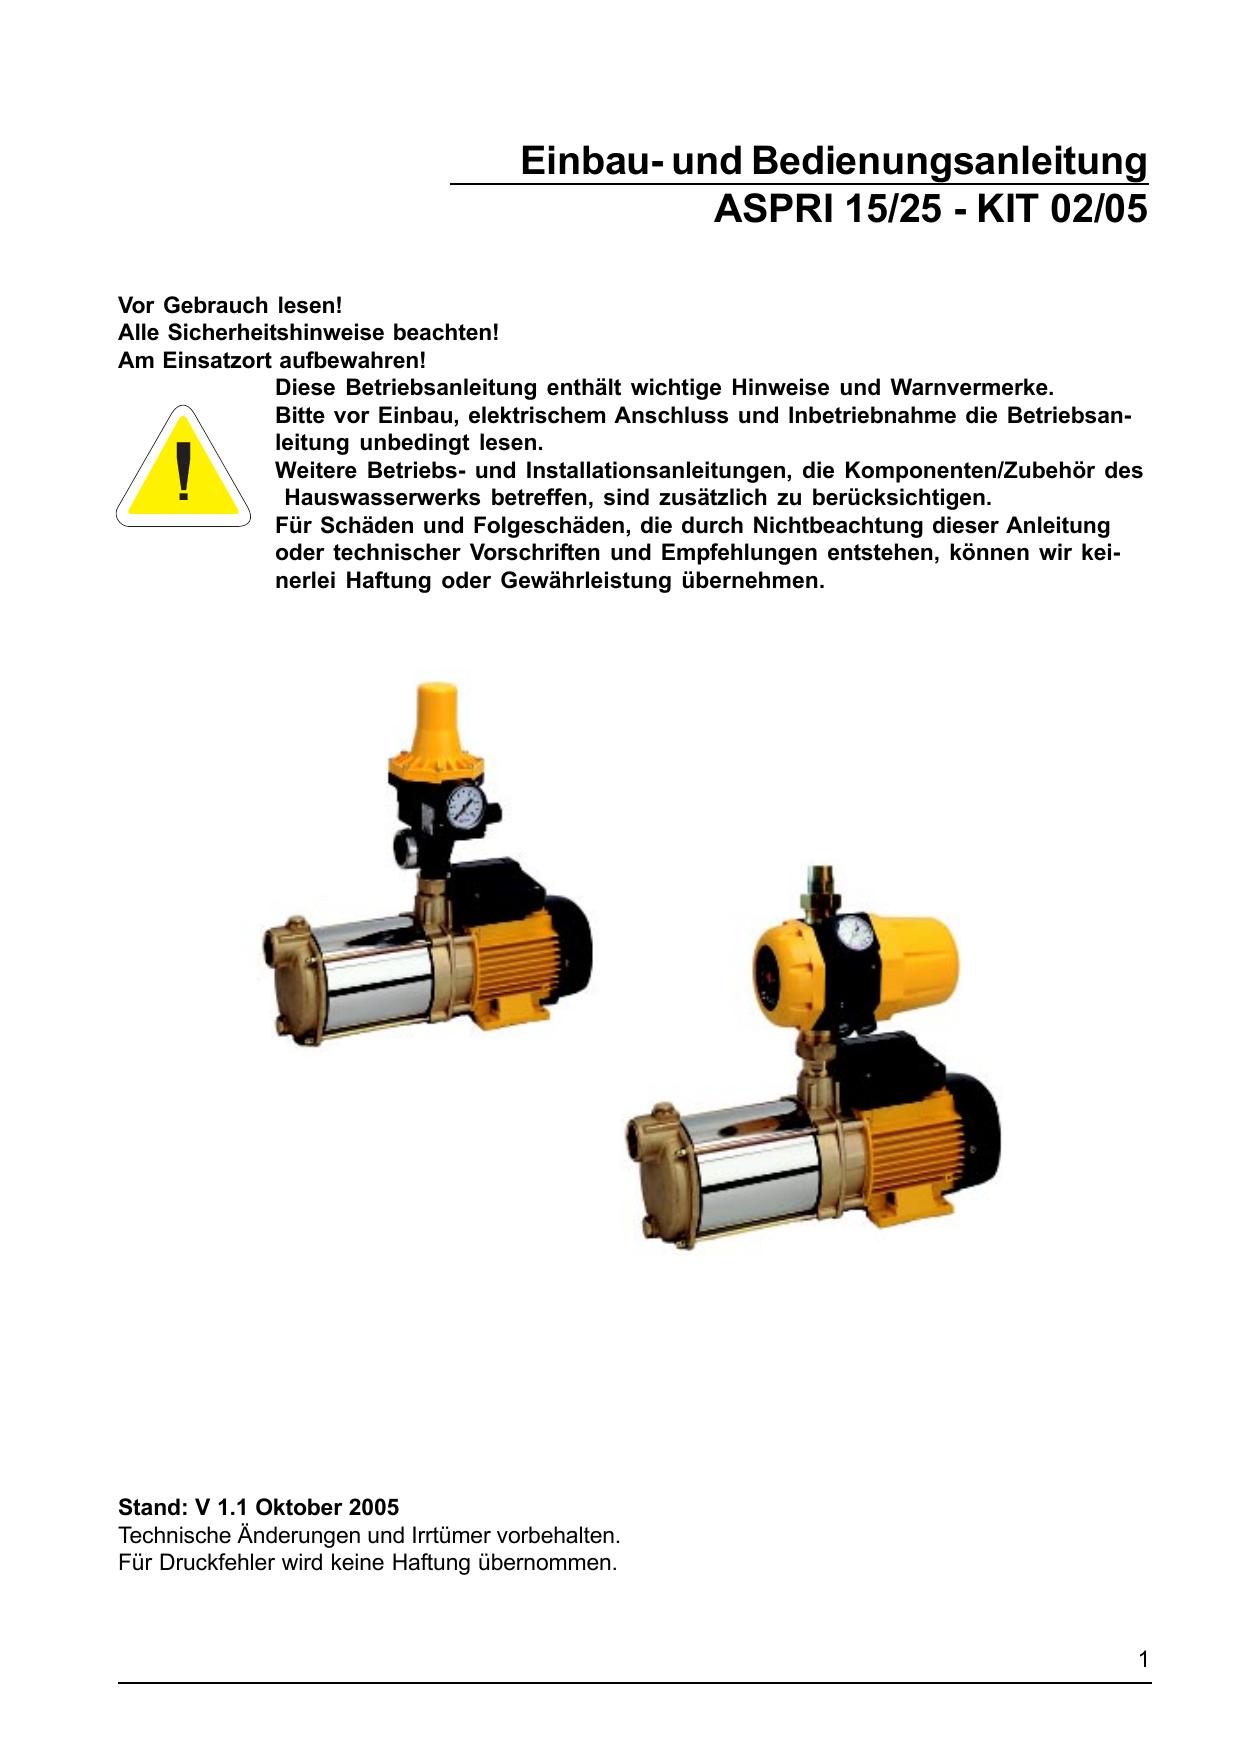 Kondensator 20µF für AL-KO Pumpen